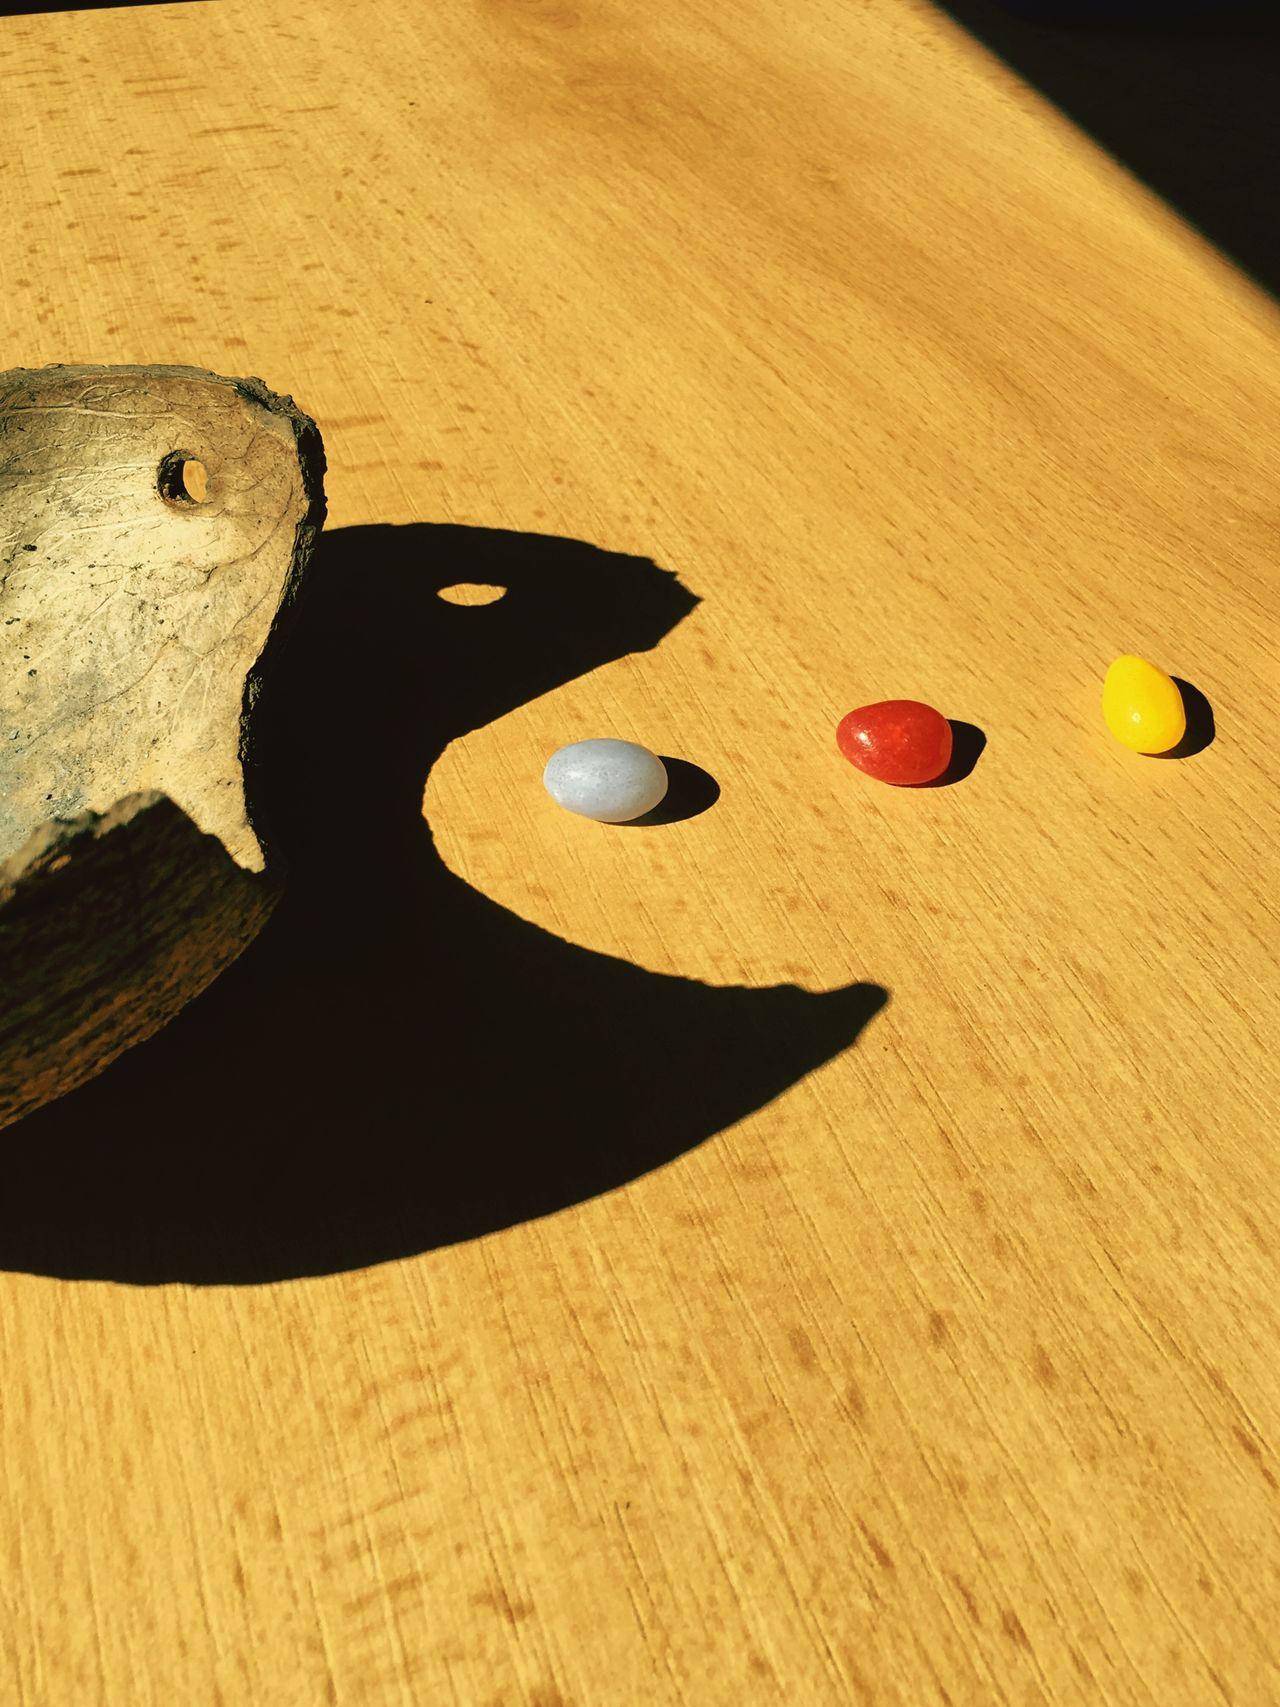 Schattenspiel  Pacman Jellybeans Wood - Material Sunnyday Sun Sonnenlicht Iphone6pluspic Iphonepicture Sunlight Sunlight And Shadow Switzerland